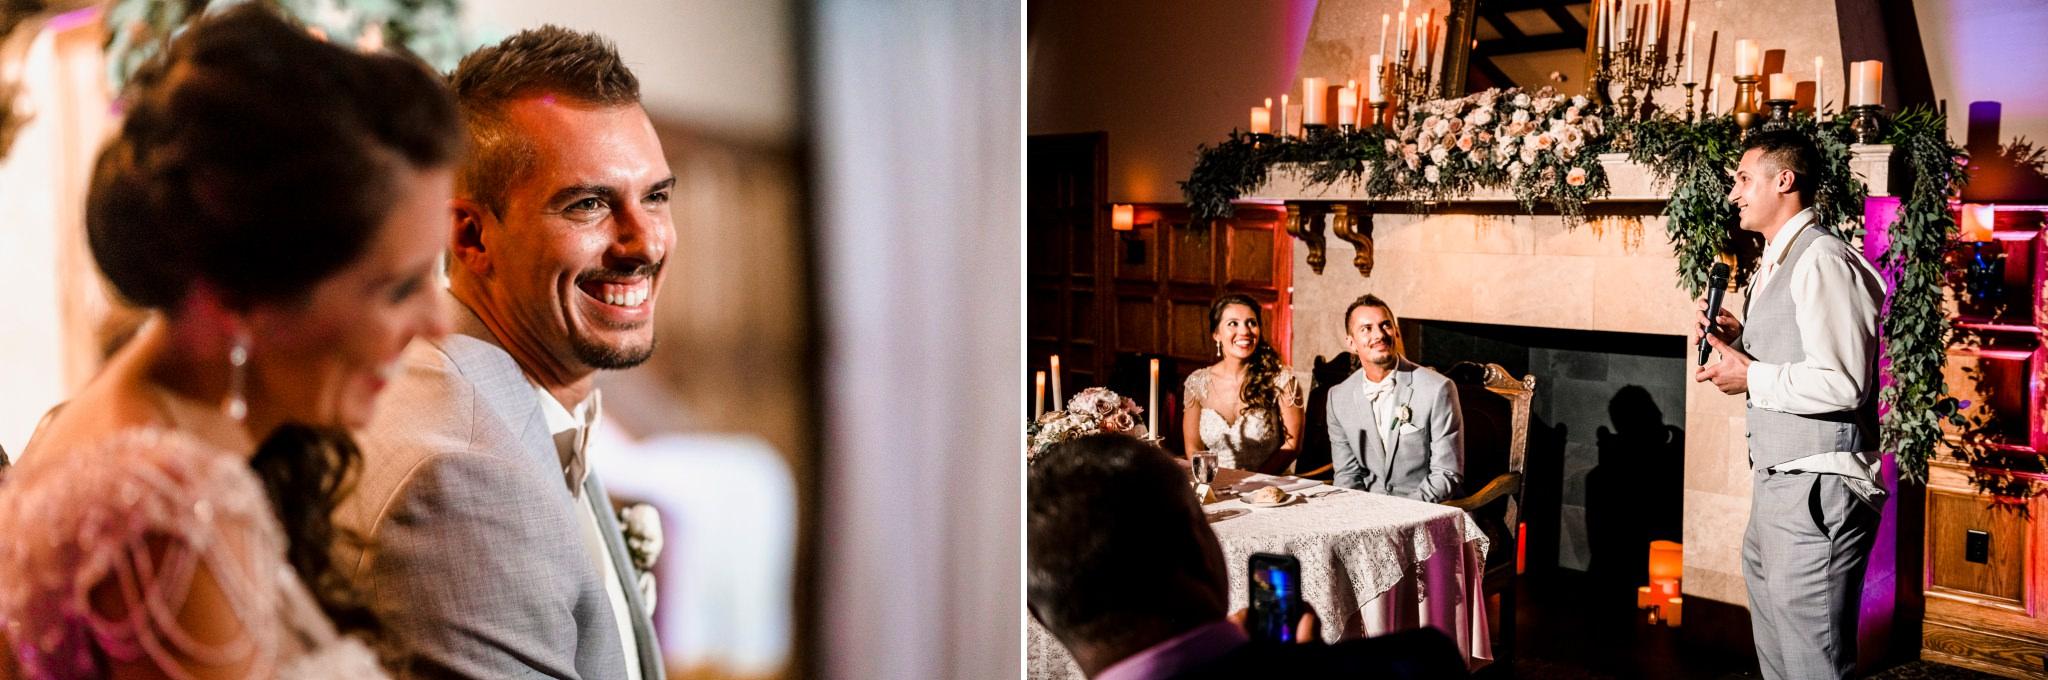 Barbato-Moorestown-Community-House-Wedding-New-Jersey-Photographer-52.JPG